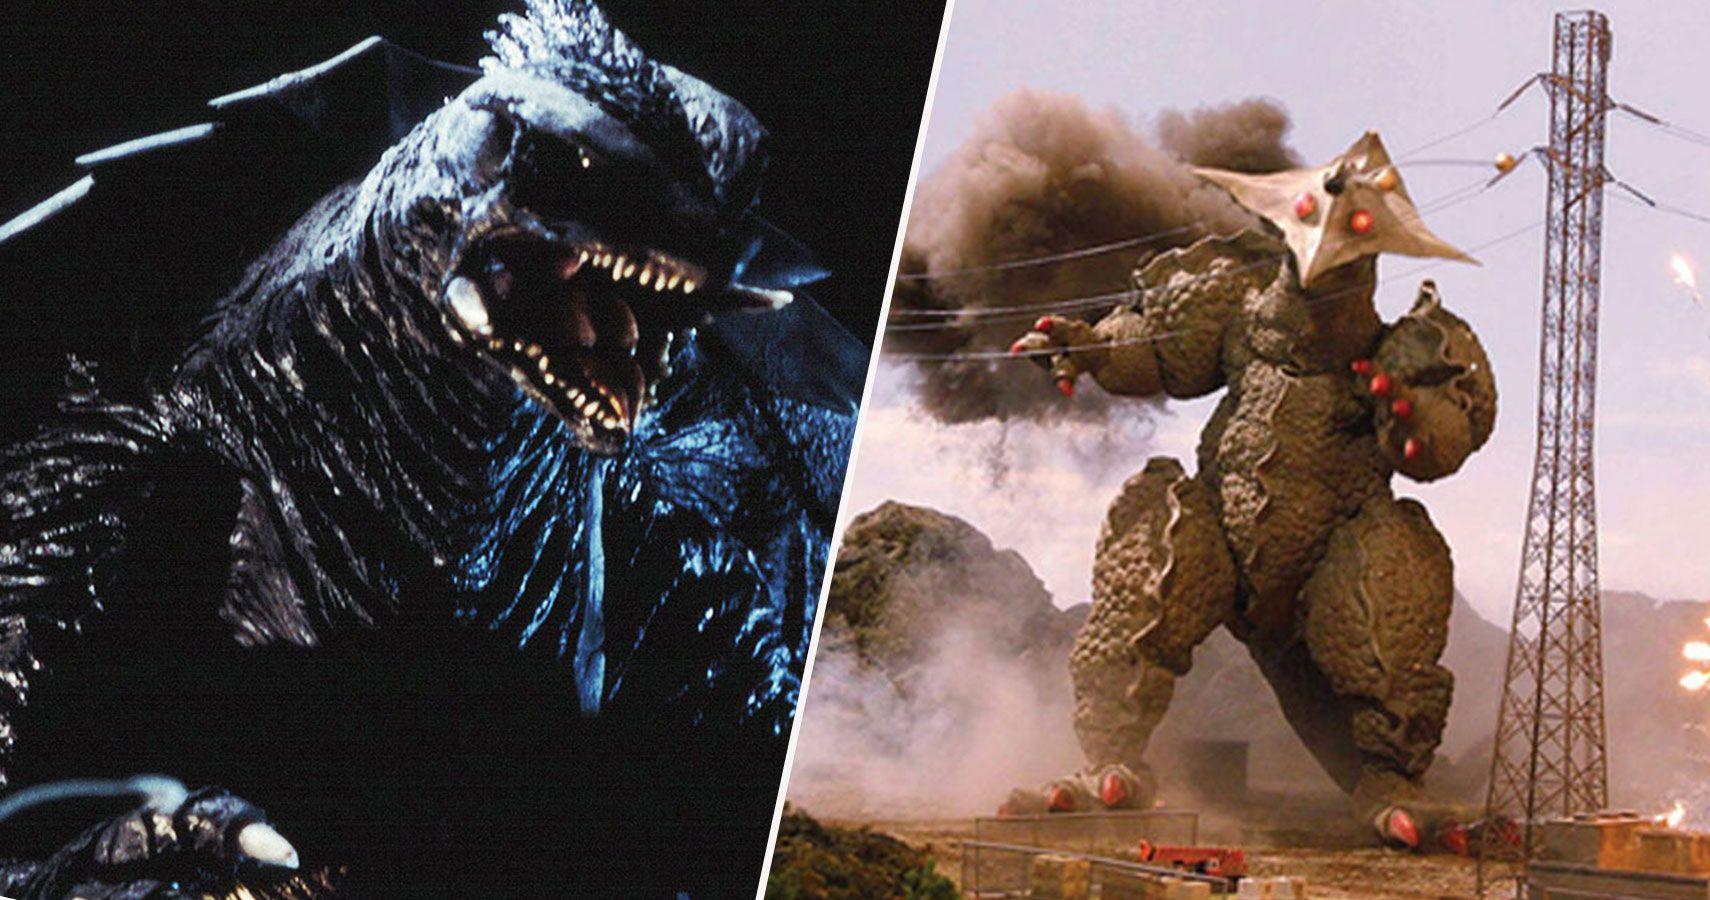 I Can't Believe It's Not Godzilla: 15 Weird Godzilla Knock-Off Flicks